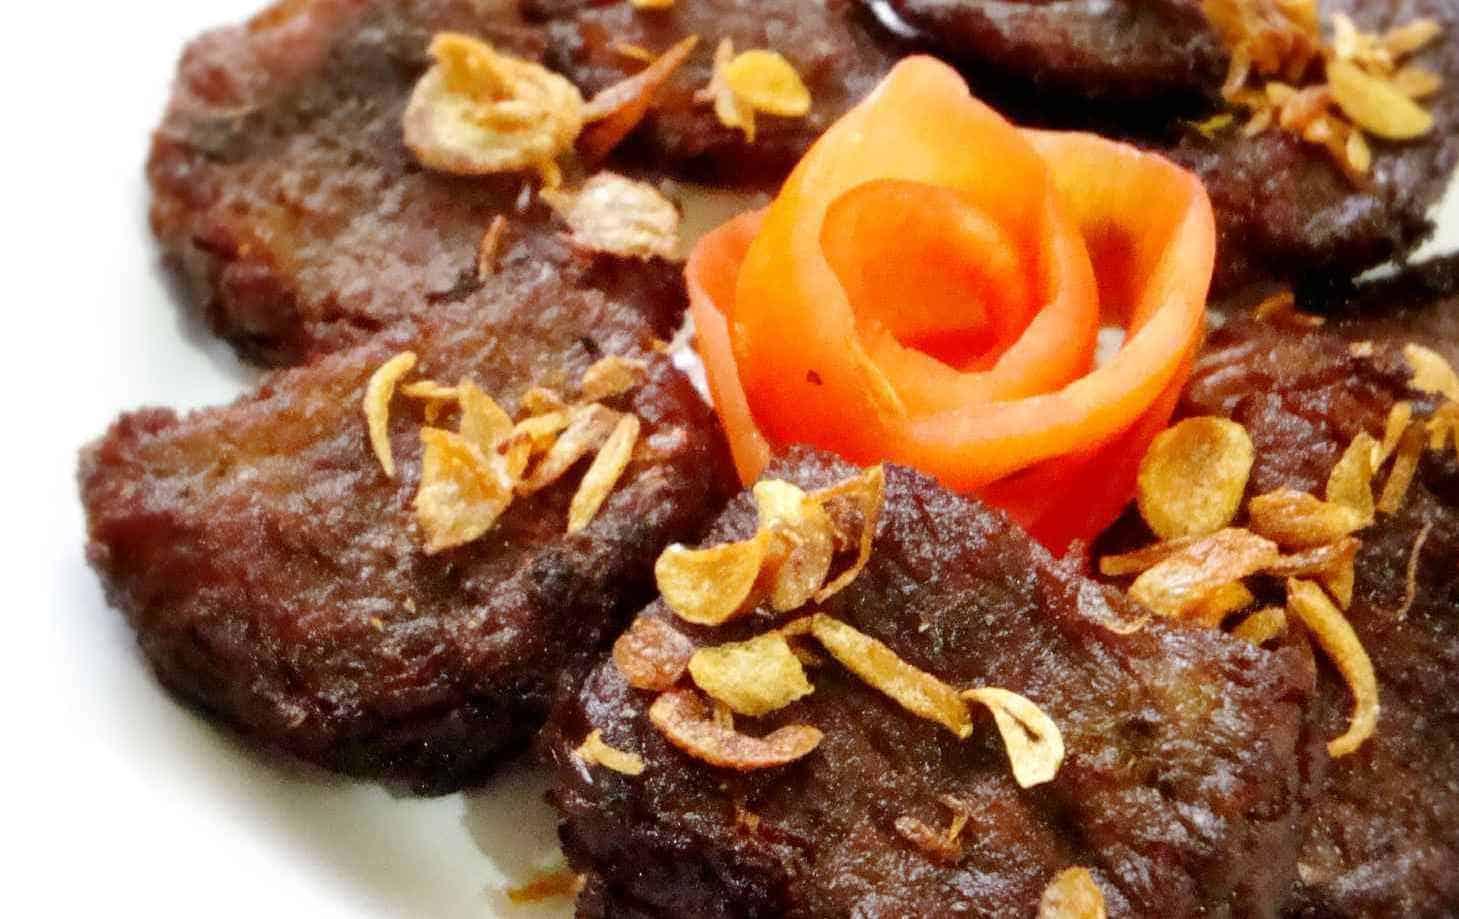 Panduan Makanan (3): Makanan yang Diharamkan dalam Hadits Nabawi